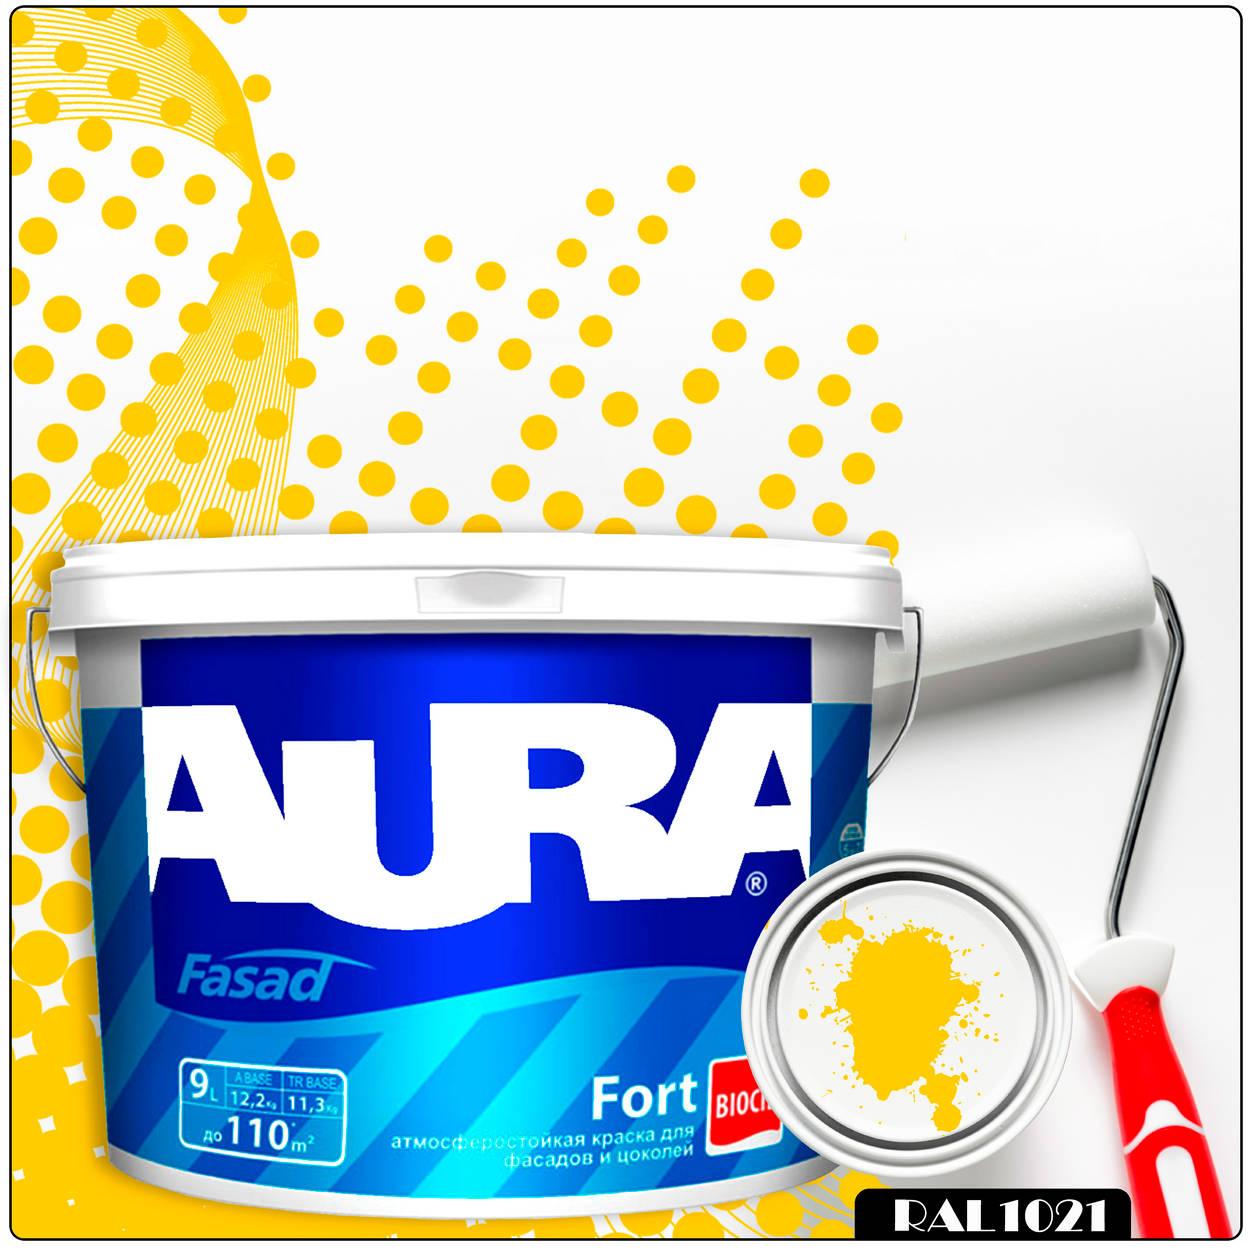 Фото 19 - Краска Aura Fasad Fort, RAL 1021 Рапсово-жёлтый, латексная, матовая, для фасада и цоколей, 9л, Аура.